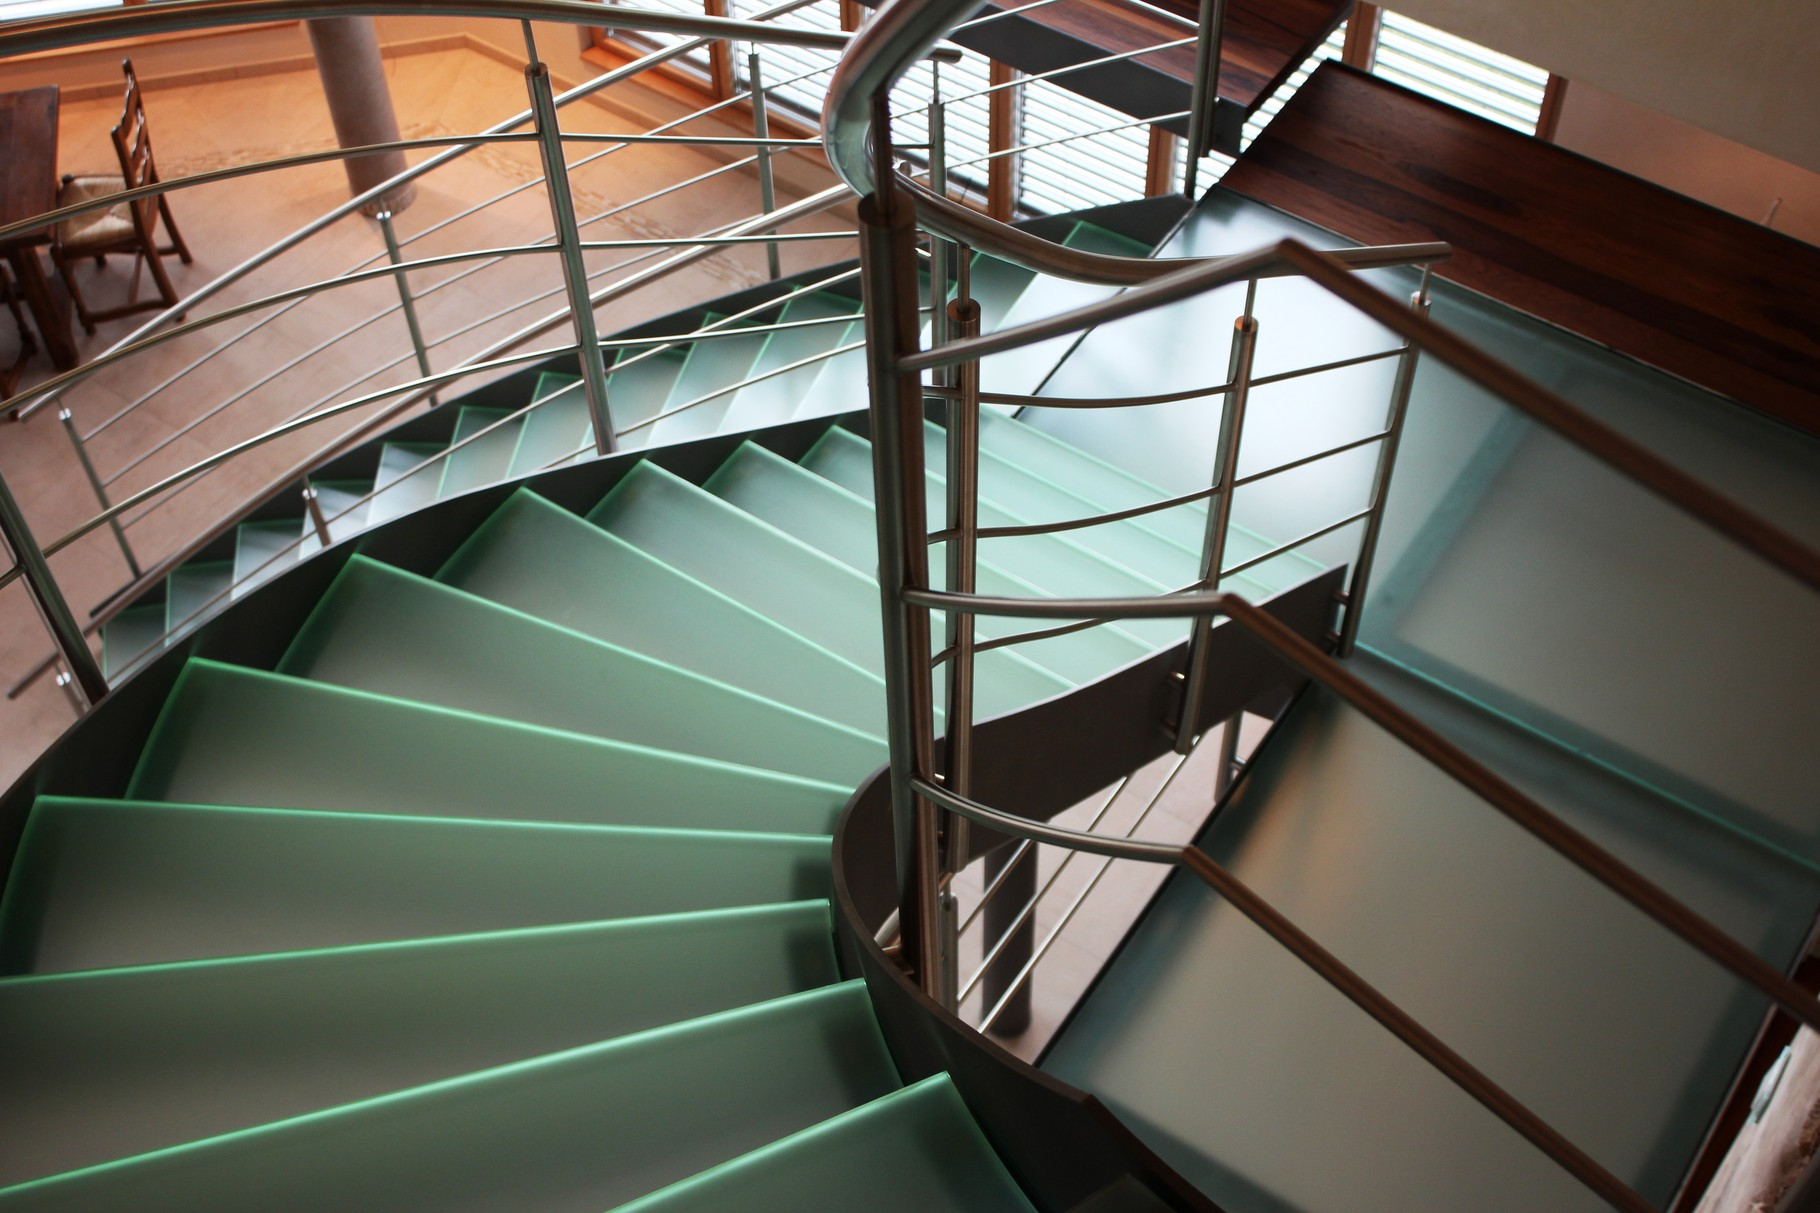 Glastreppe Luxemburg G 110 - Treppe des Jahres 2012